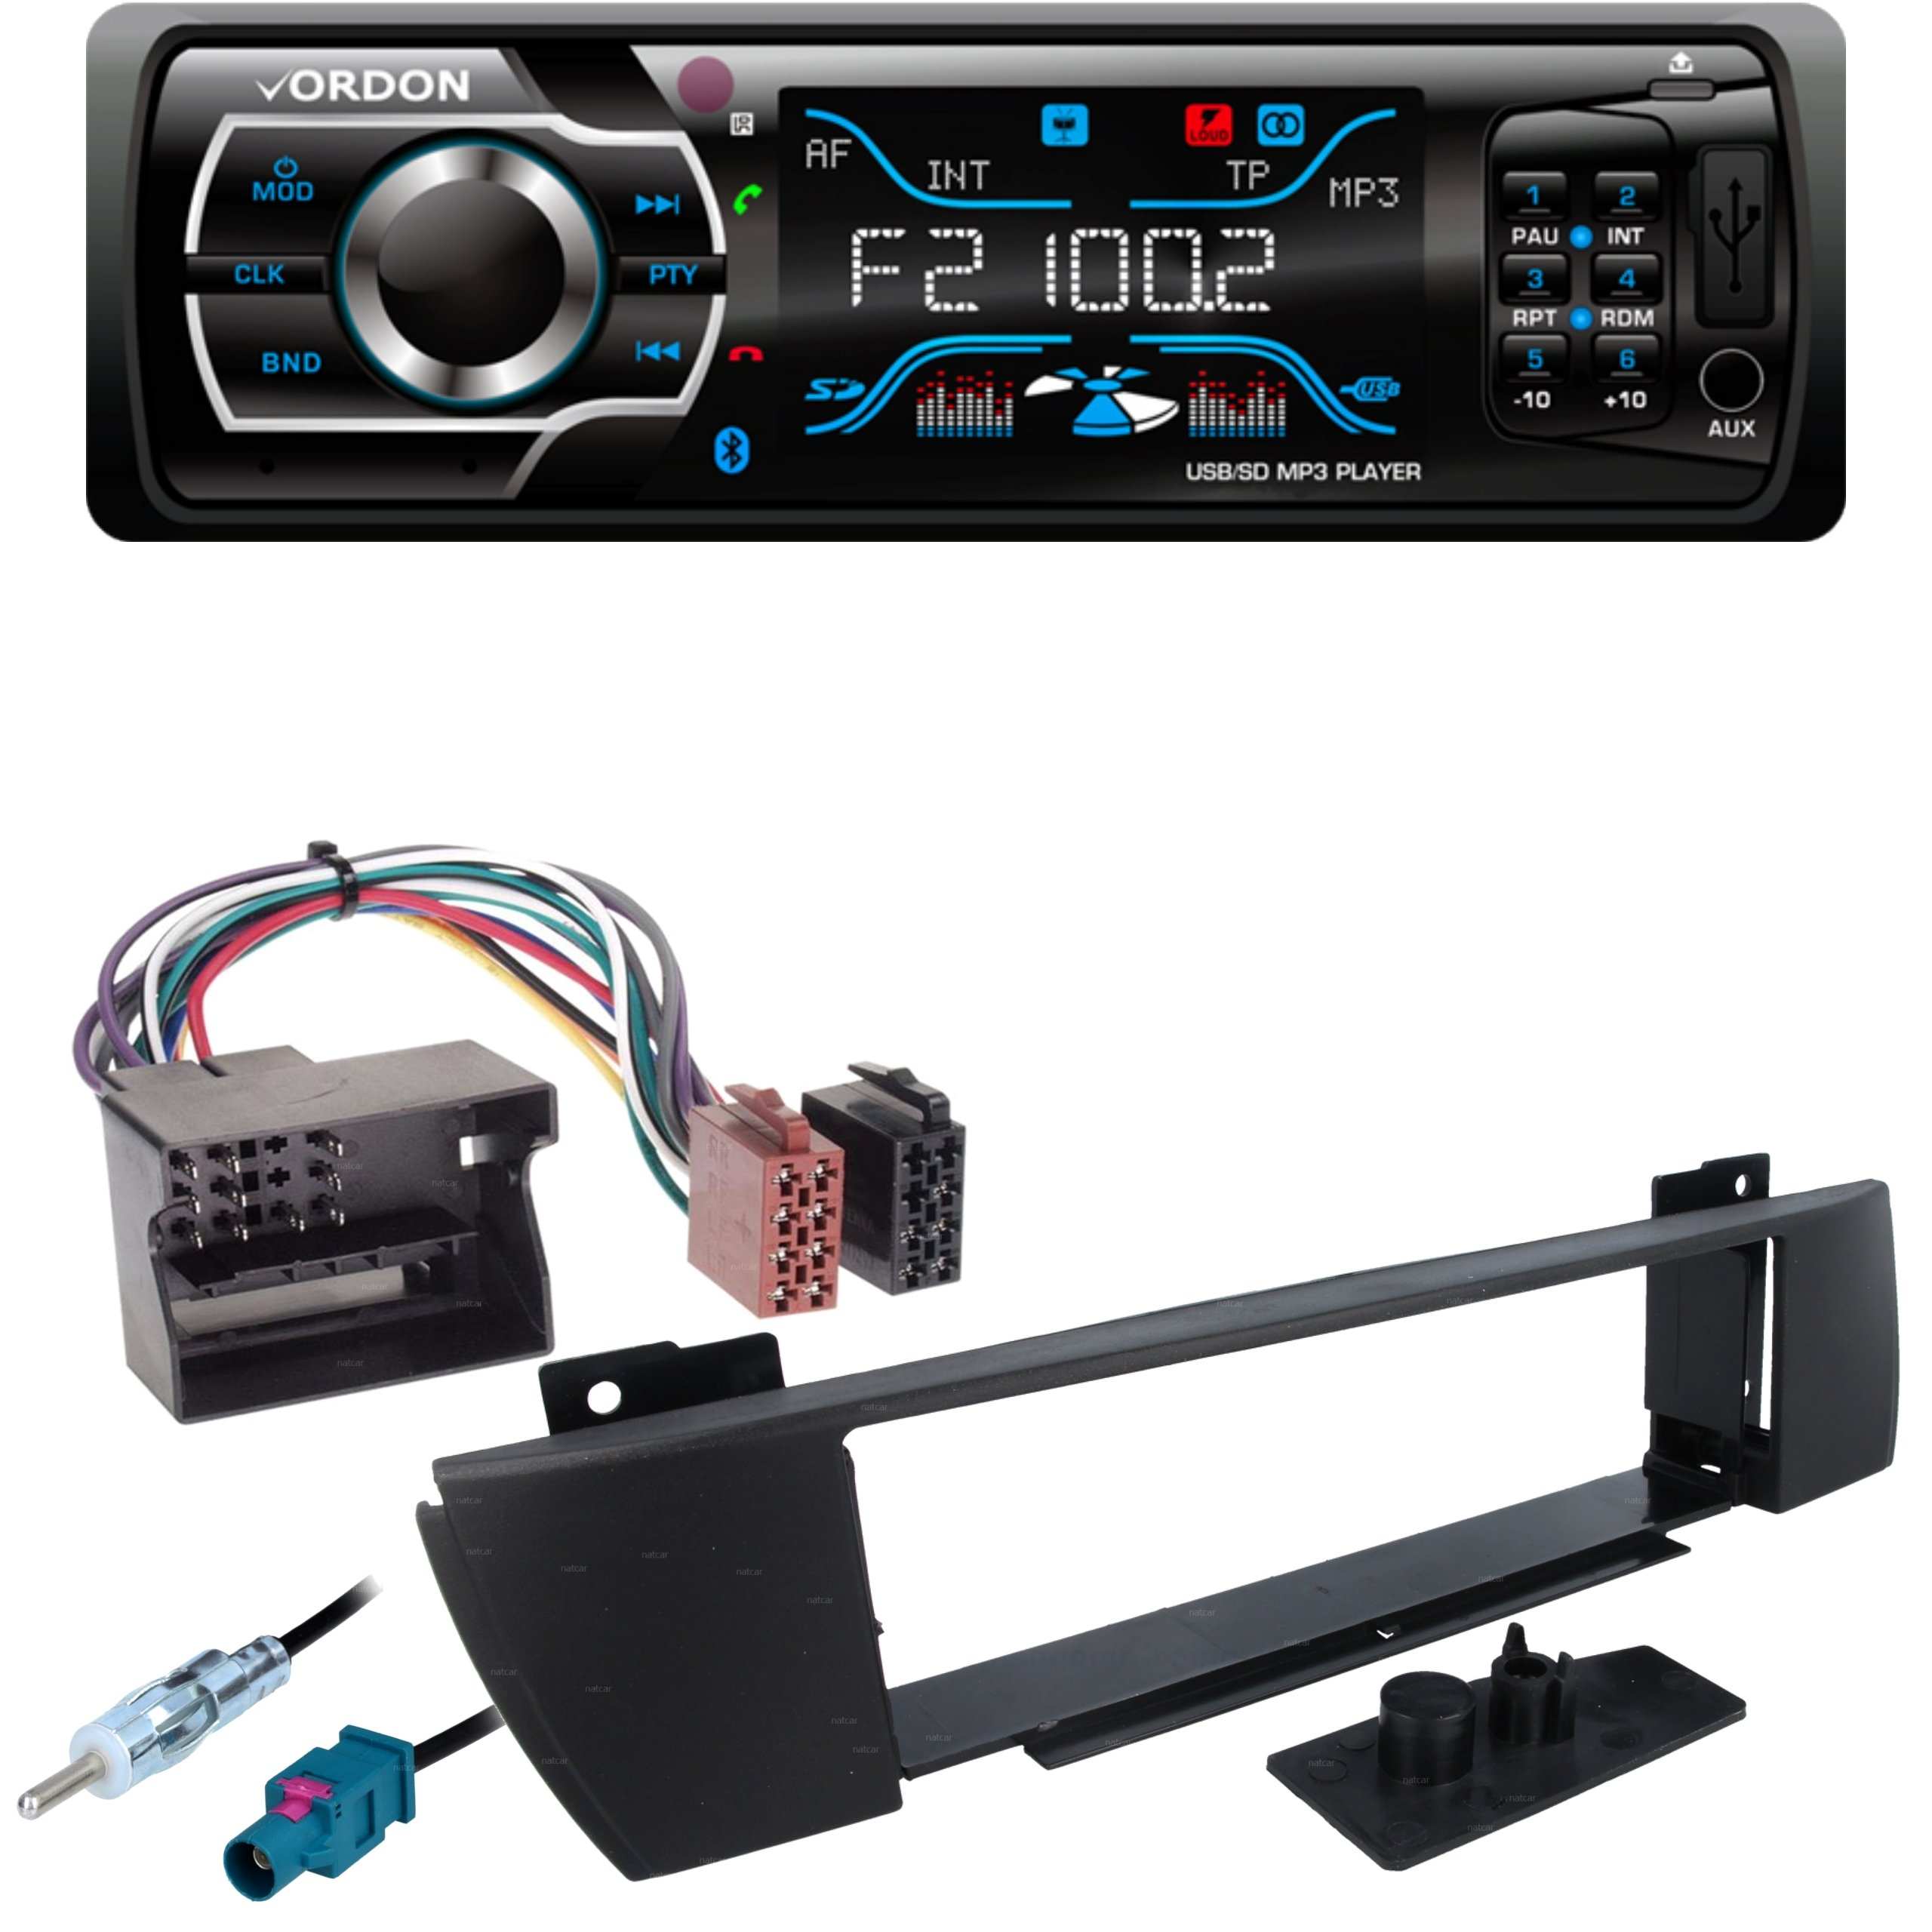 Radio Vordon Bluetooth Usb Bmw X3 E83 2004 2010 6952087793